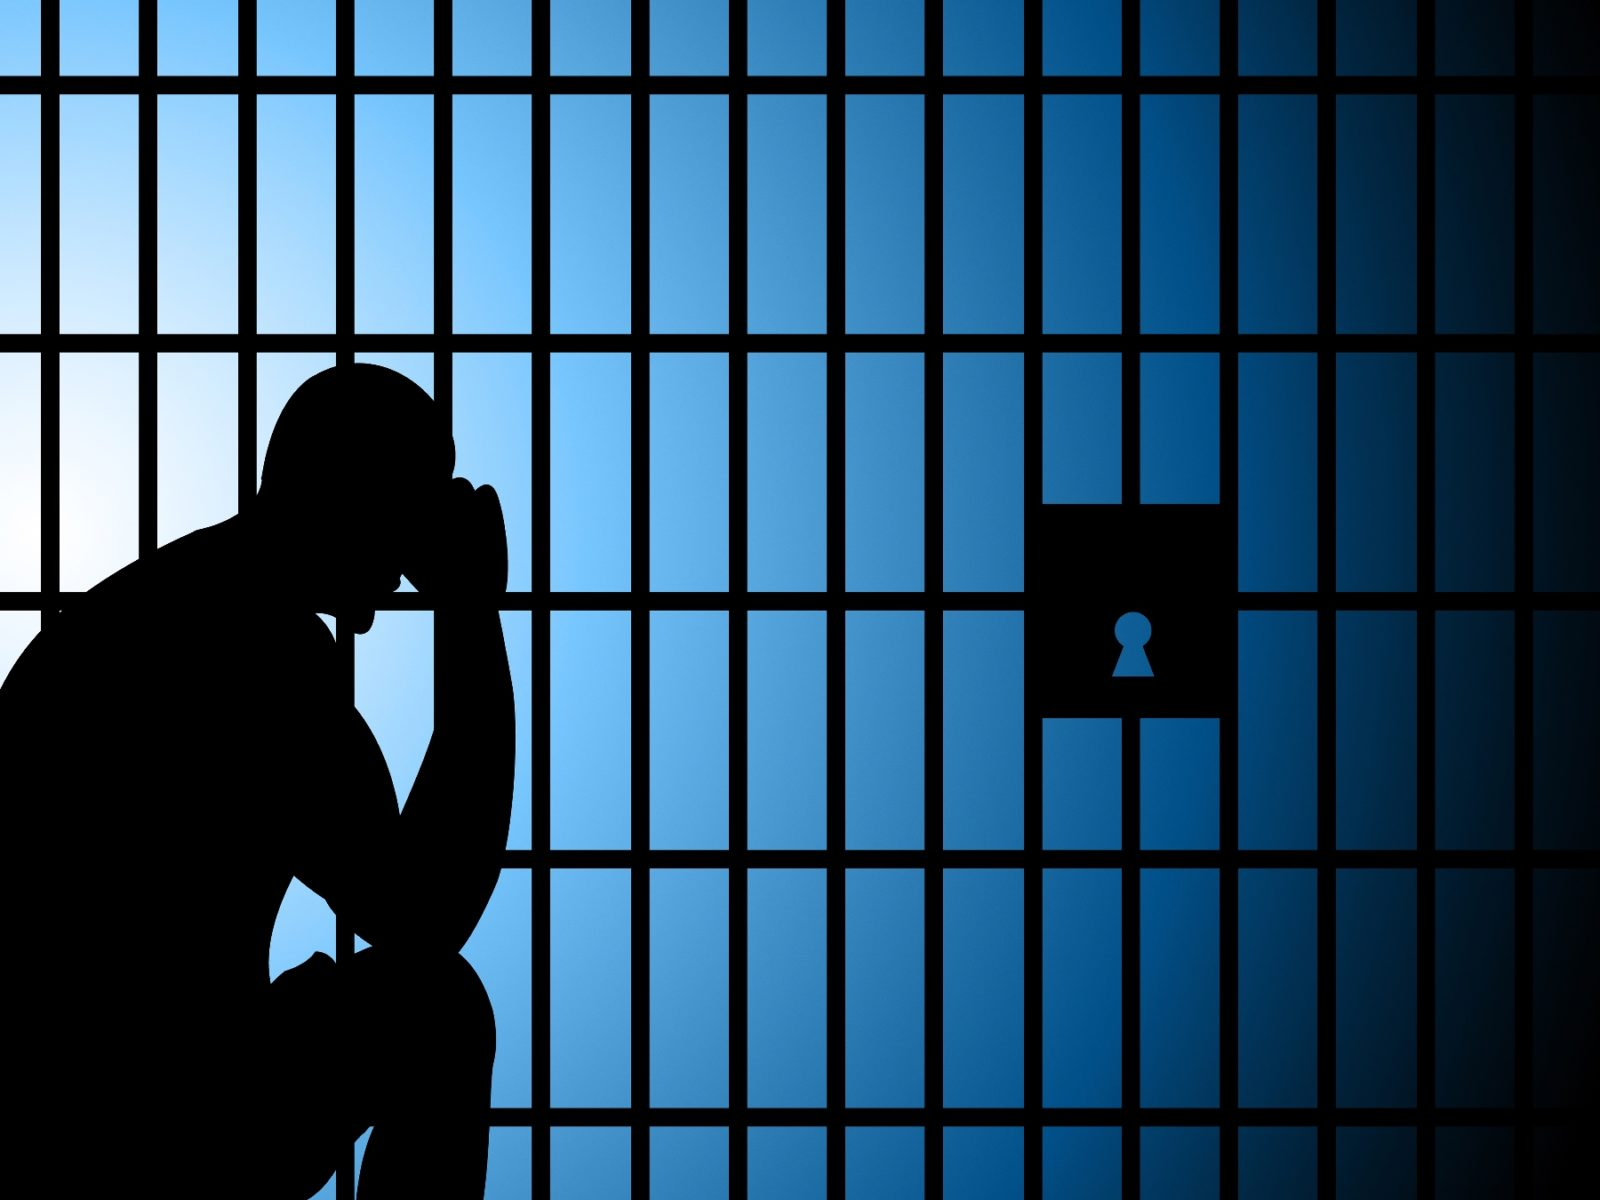 jail_prison_depressed